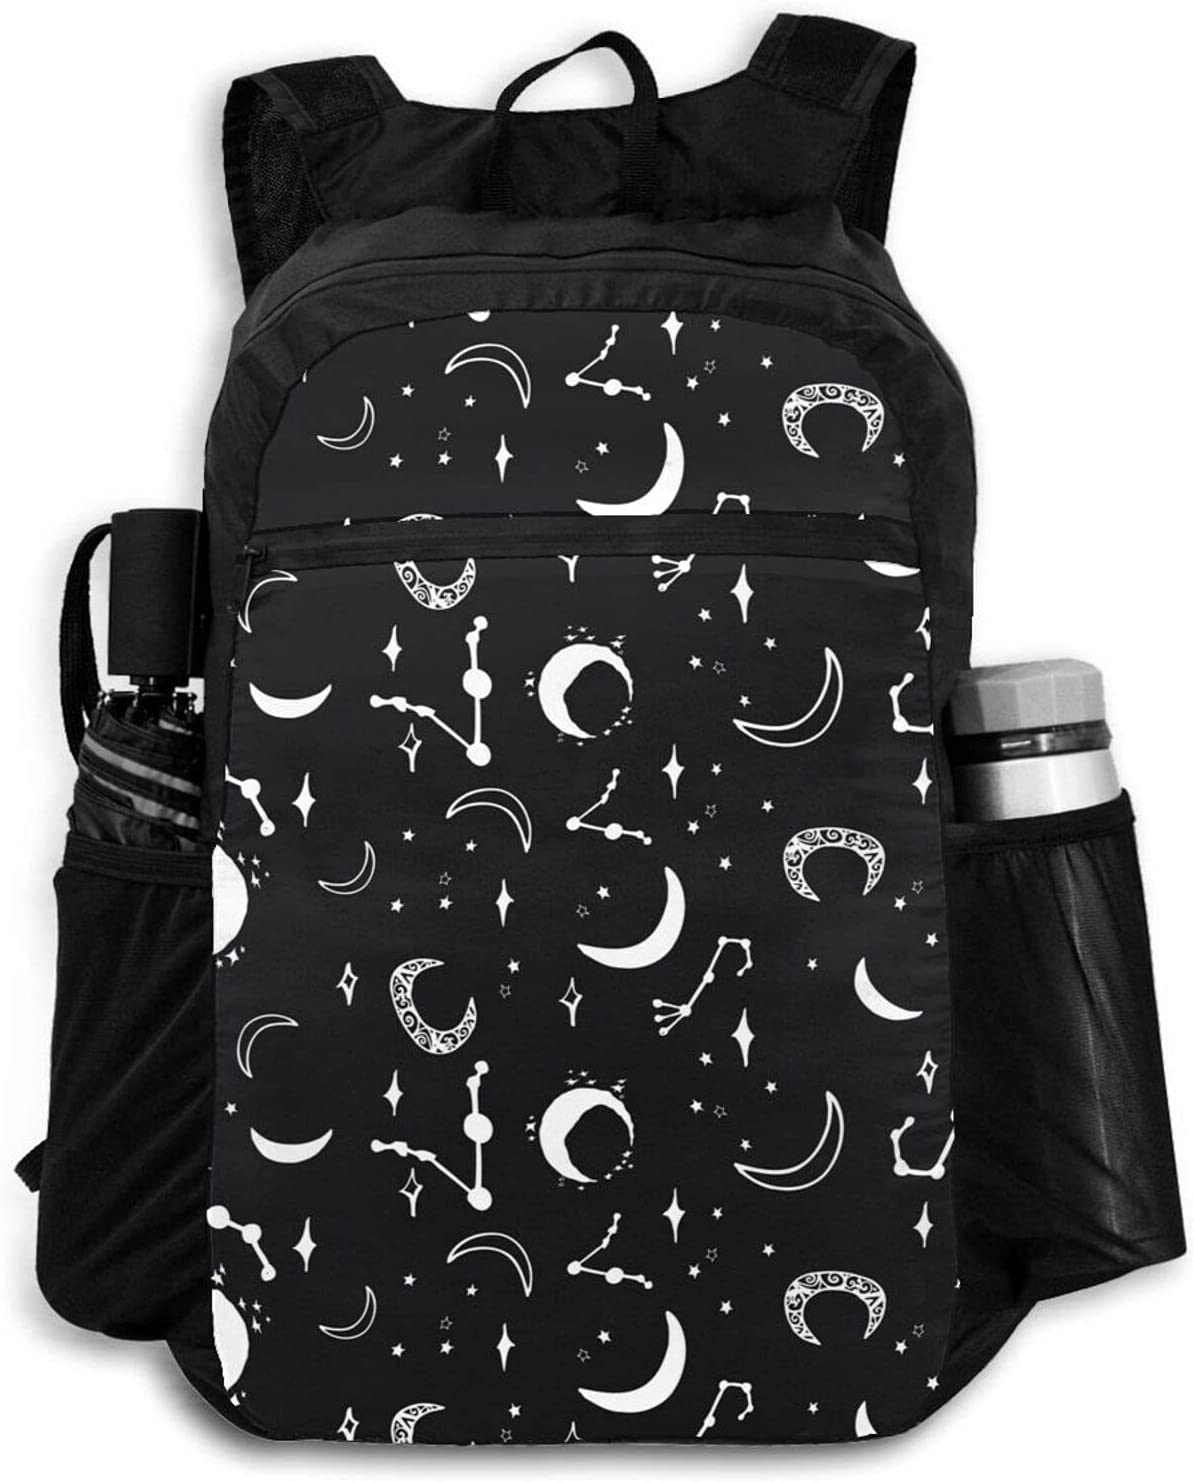 Popular Zolama Magic Moon Star Black Backpacks Cute Packab Women Ranking TOP19 Men for